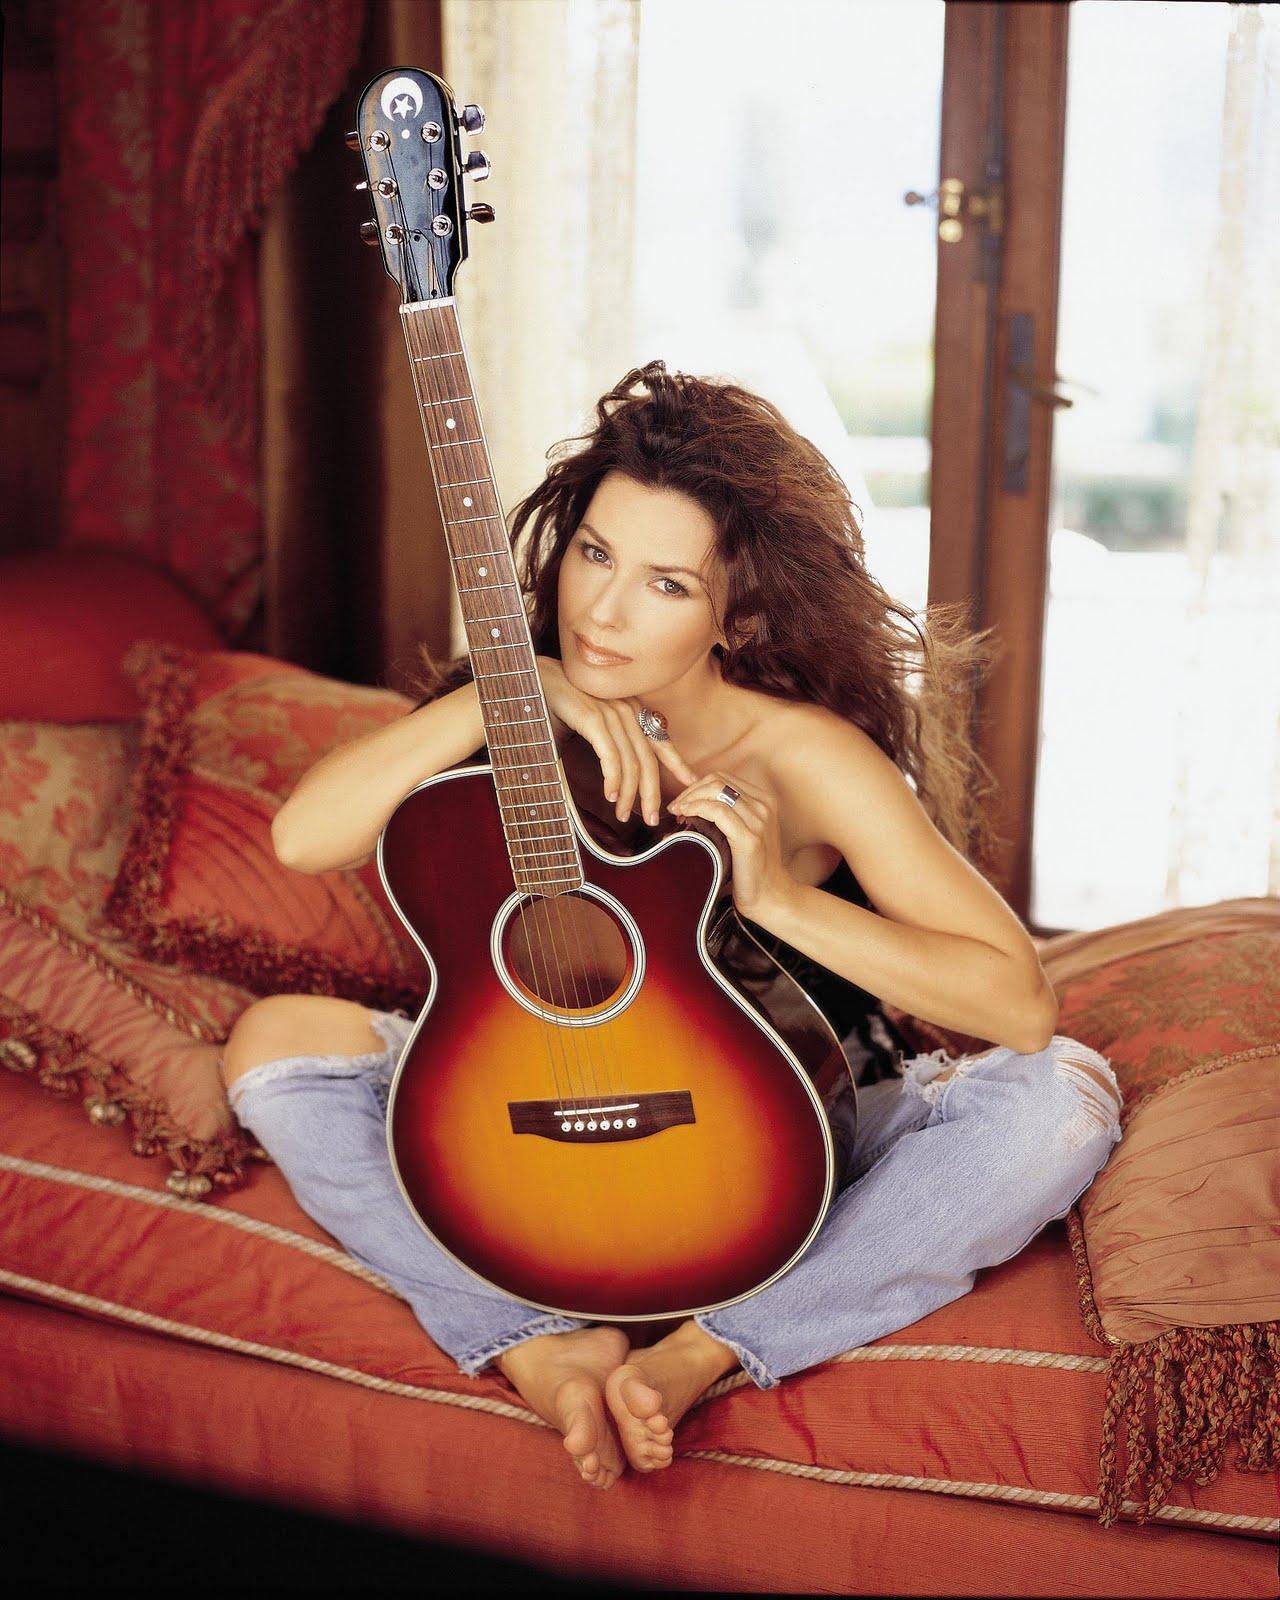 http://2.bp.blogspot.com/-B6EGdogrogg/TfJh0PH-upI/AAAAAAAAADU/A5QTz6KAcrw/s1600/Shania+Twain+1+musicnfeet.jpg